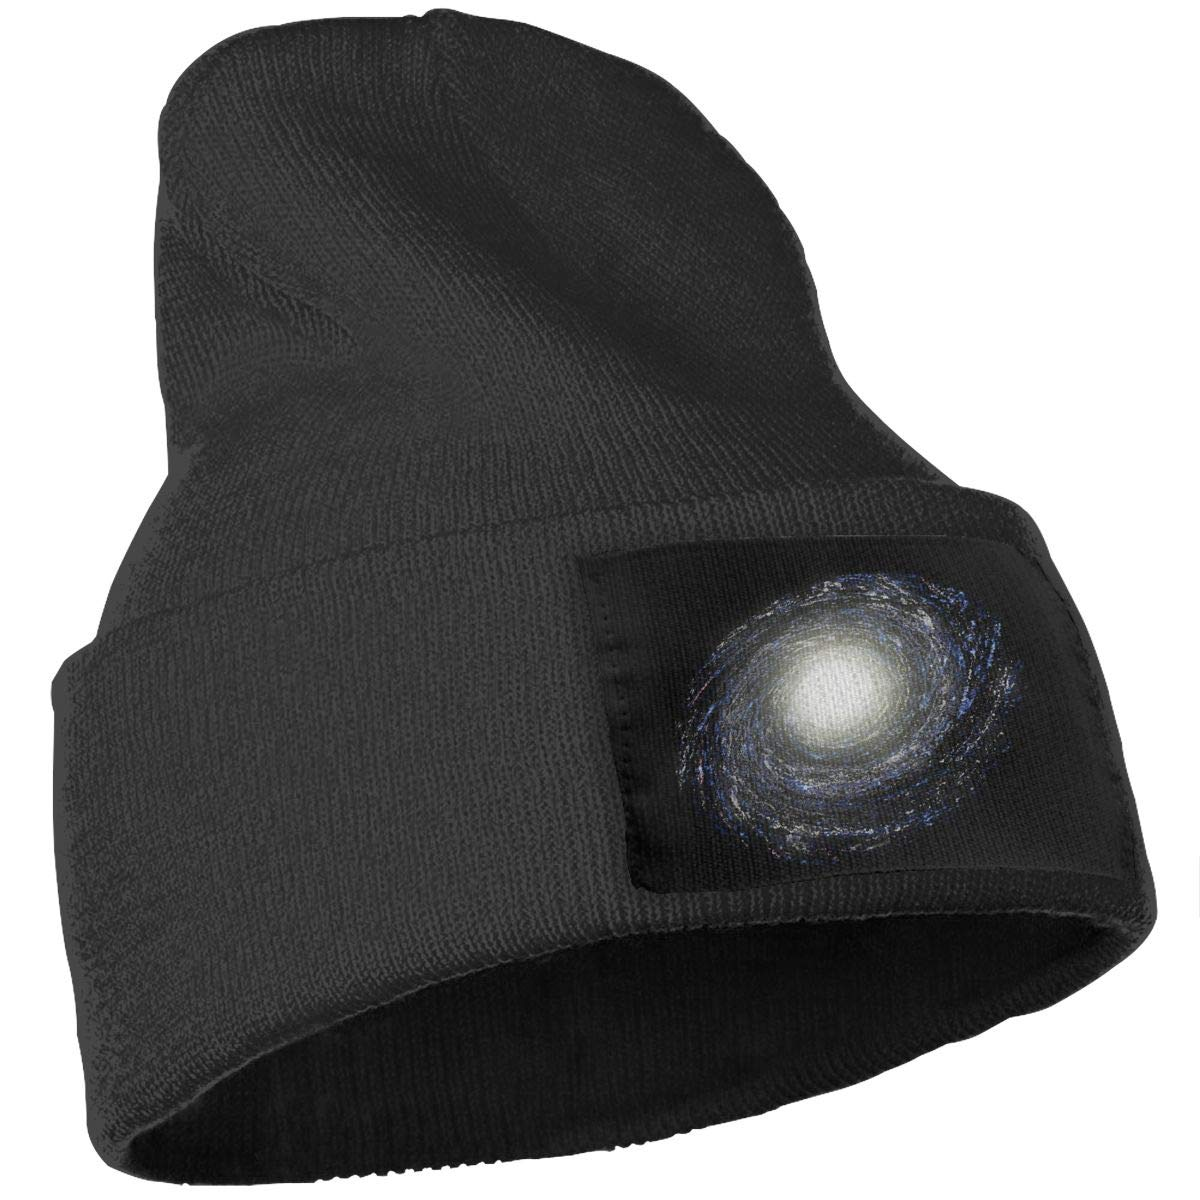 Milky Way Galaxy Cute Ski Cap Unisex 100/% Acrylic Knitted Hat Cap